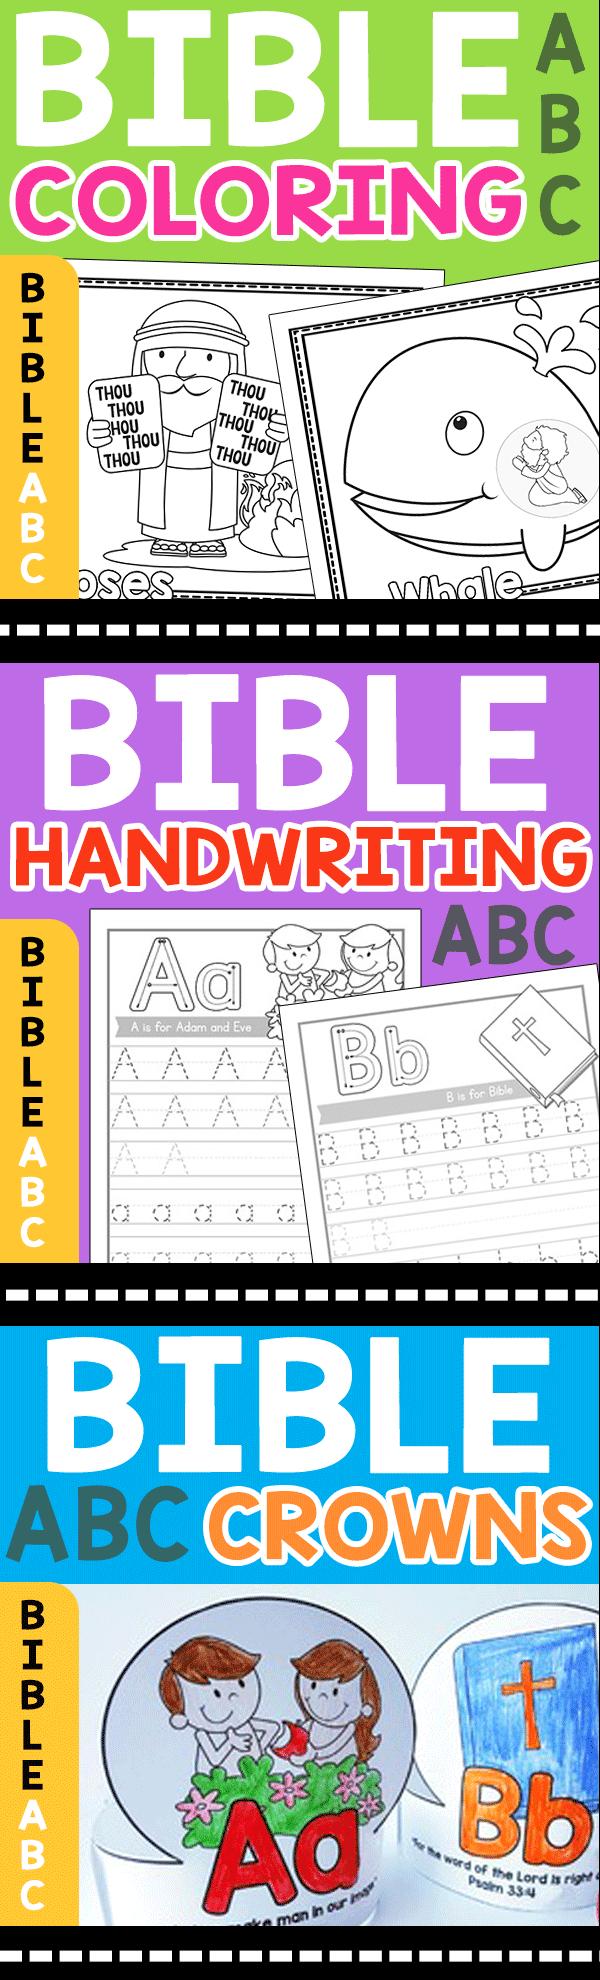 Bible Bingo - Christian Preschool Printables - Free Printable Bible Bingo For Preschoolers